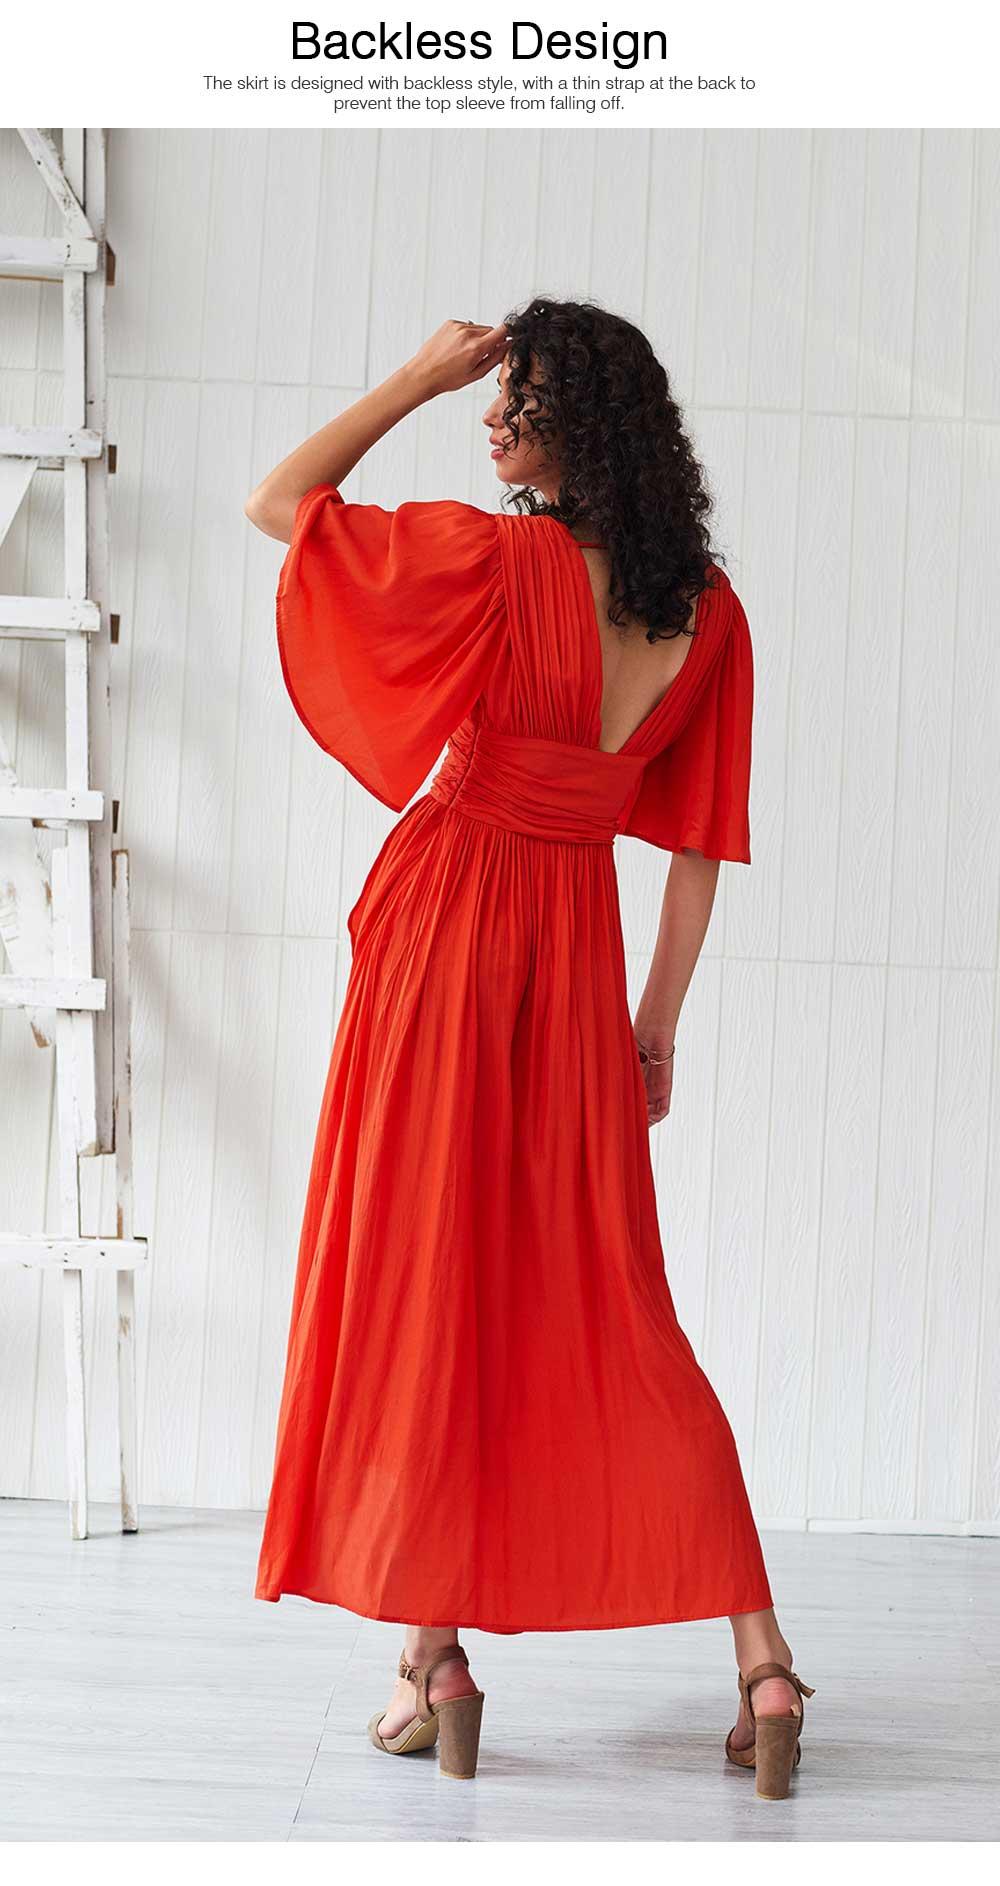 Deep V-neck Bohemian Dress Slim Waist Belt Irregular Style Orange Skirt Maxi Dress Summer for Women 5